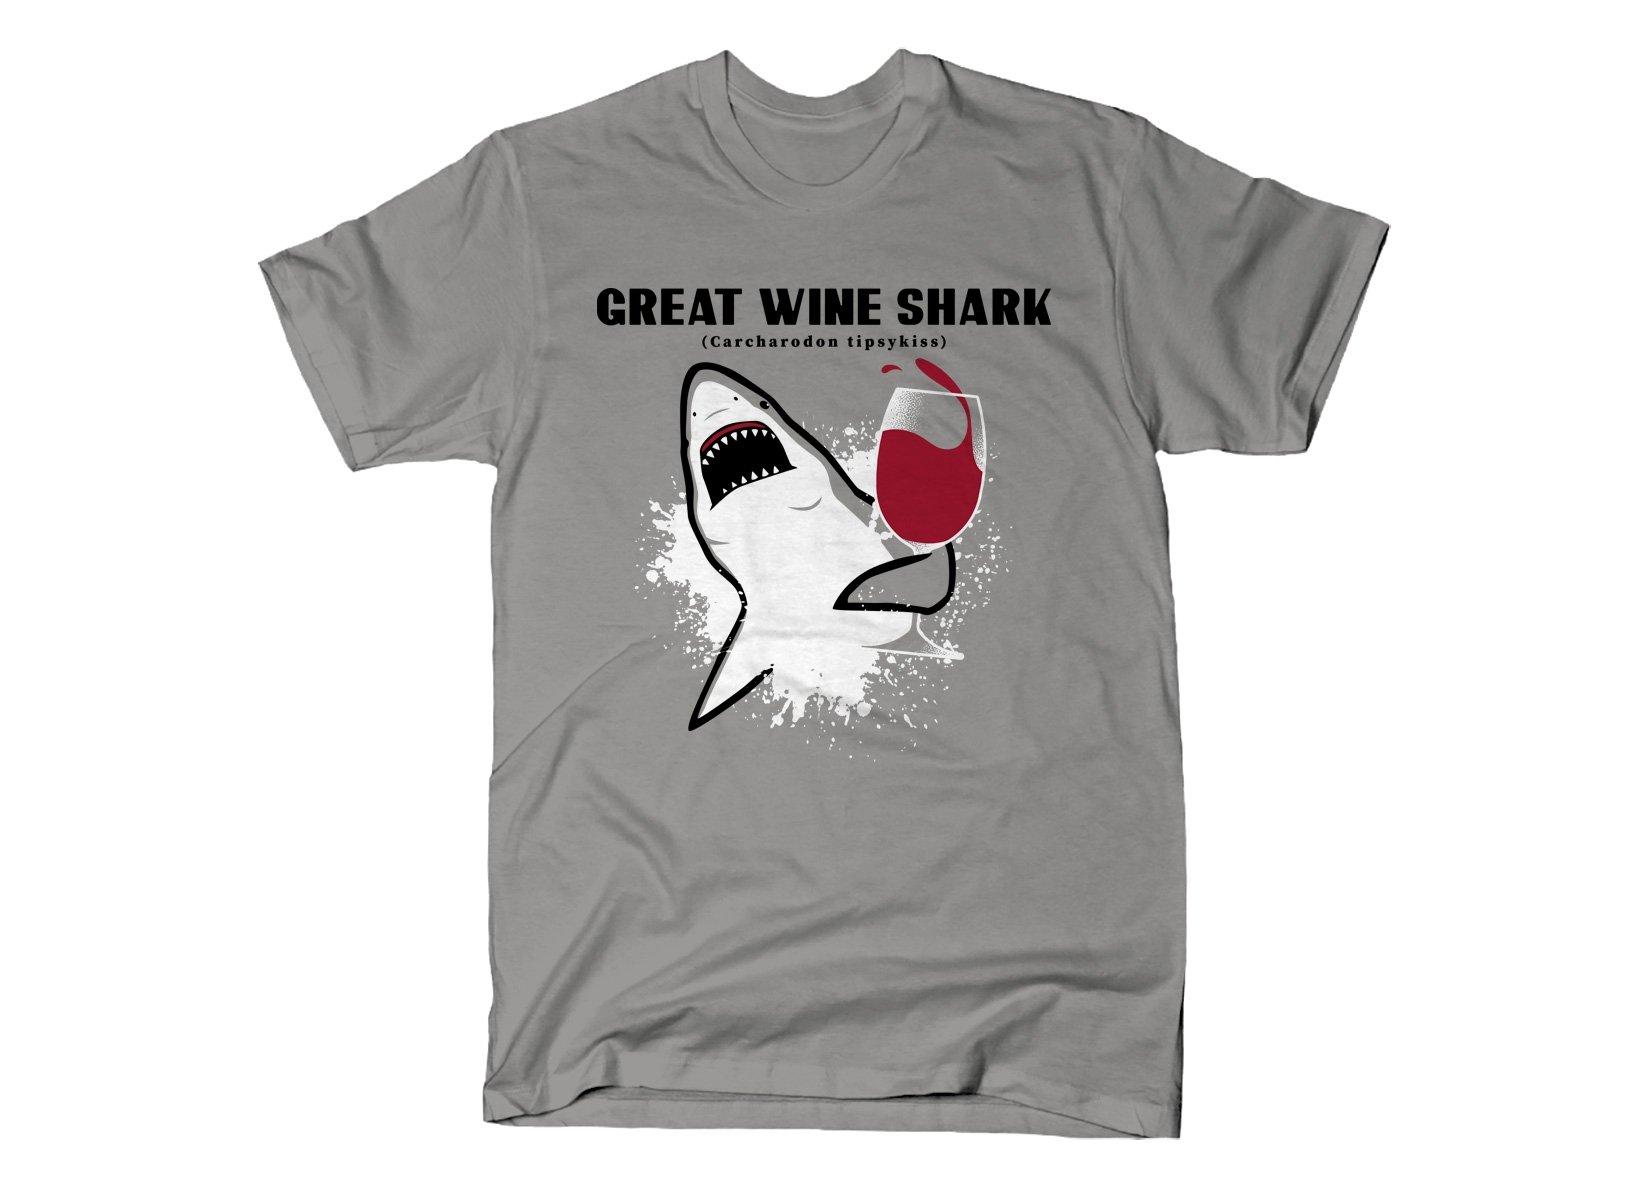 Great Wine Shark on Mens T-Shirt